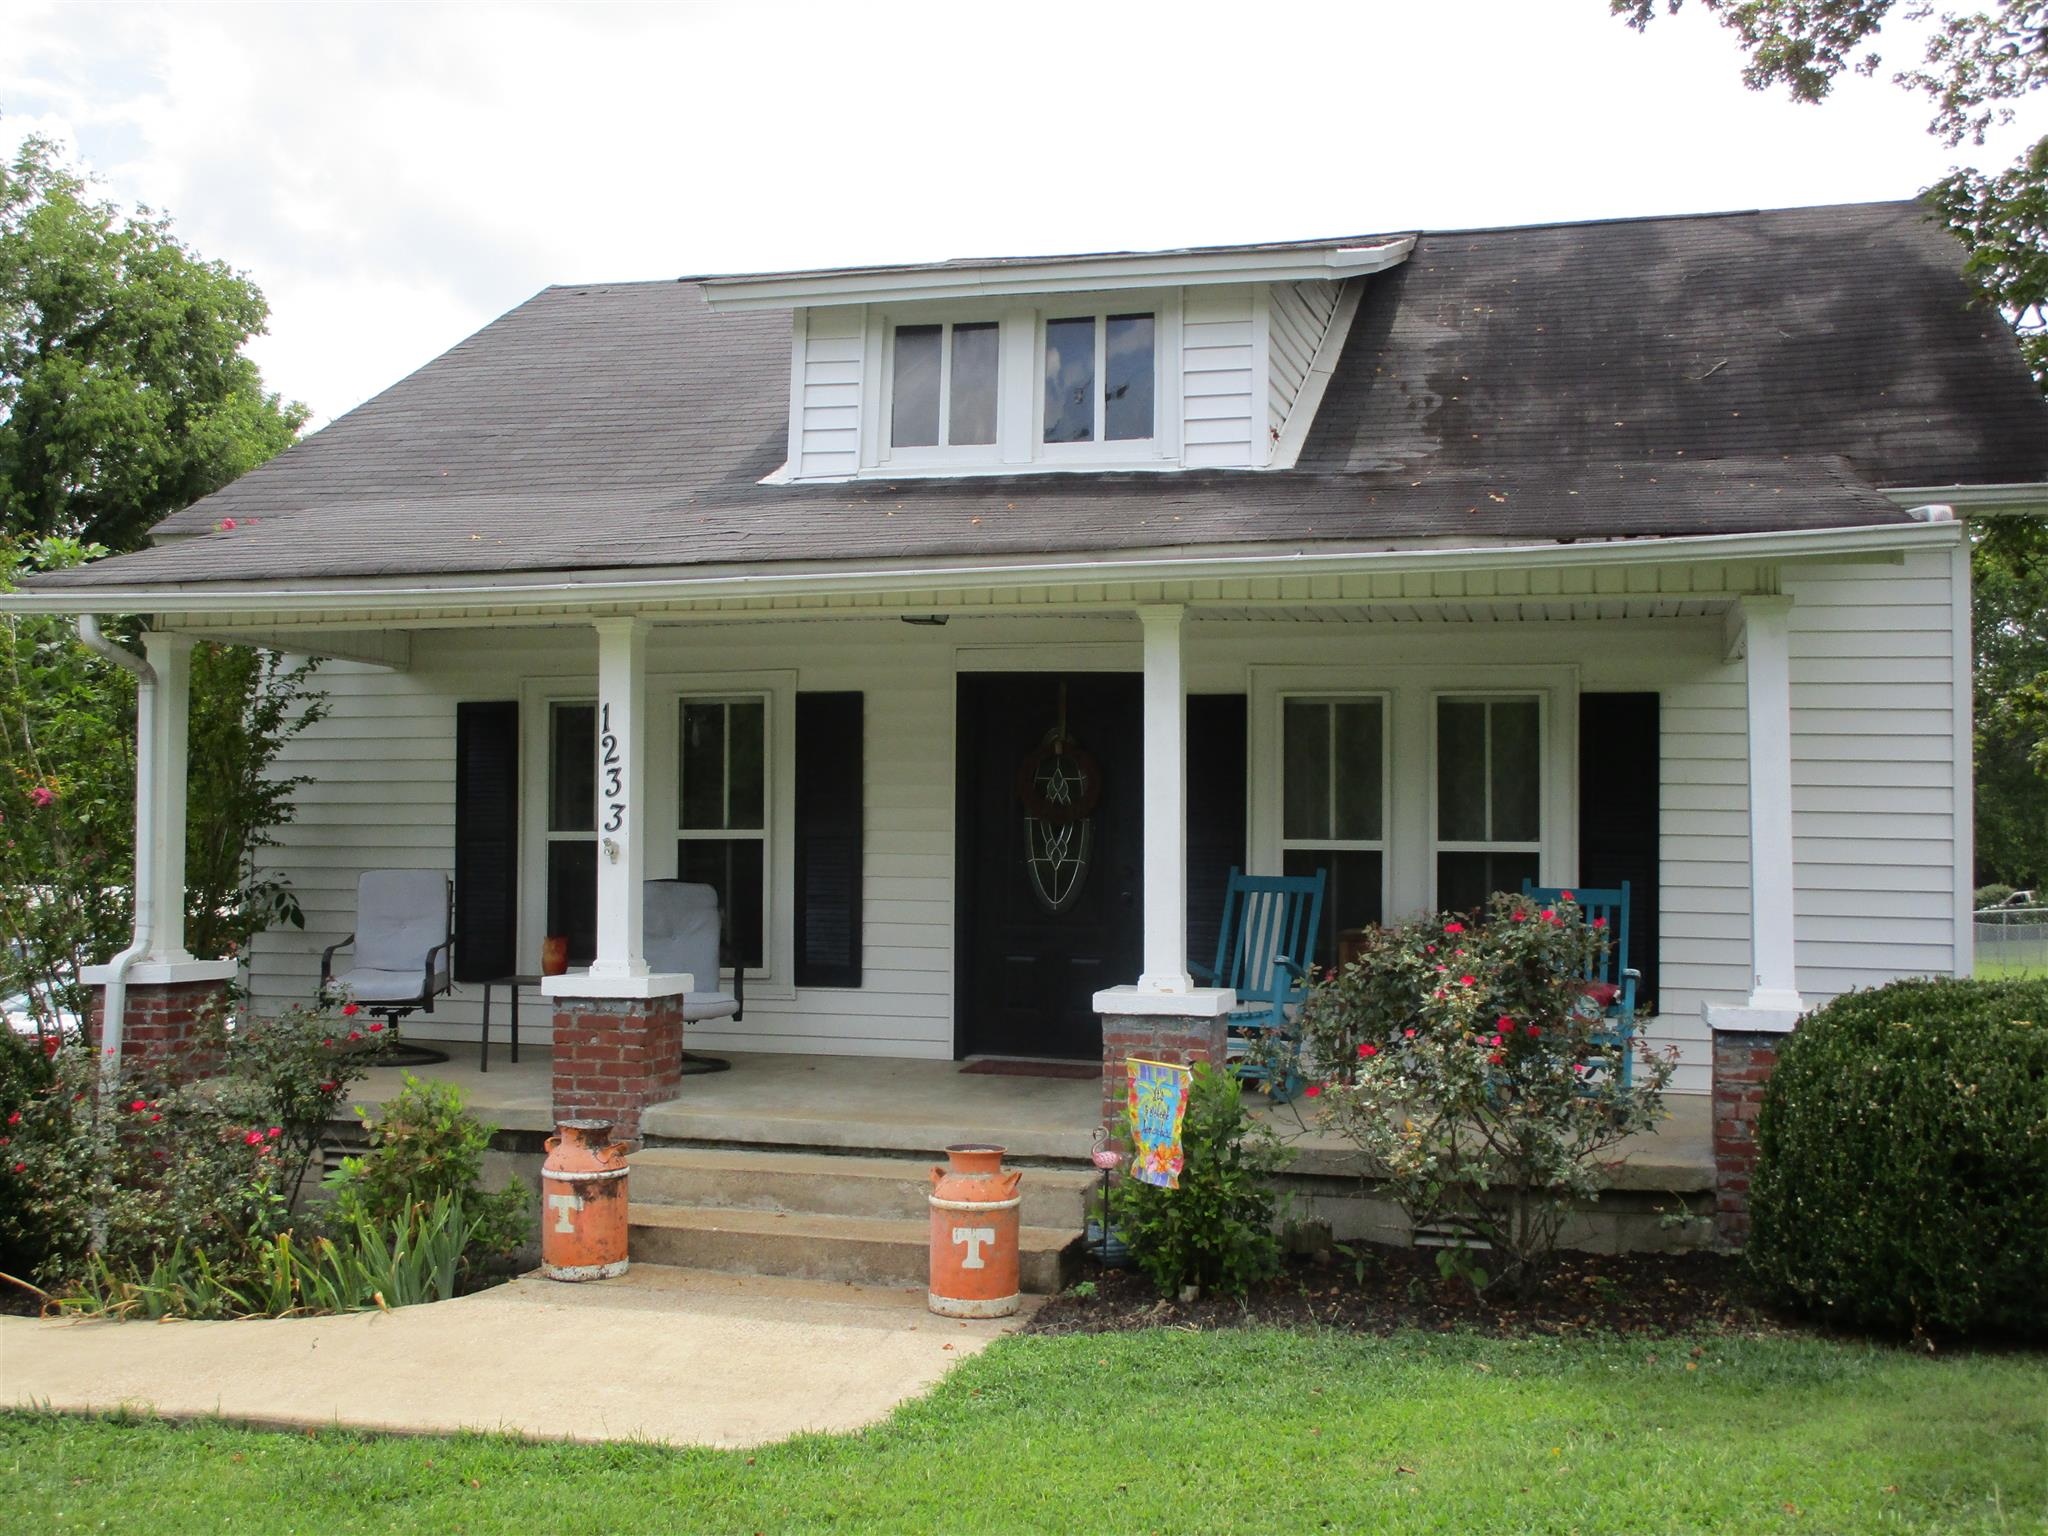 1233 E Jefferson St, Pulaski, TN 38478 - Pulaski, TN real estate listing